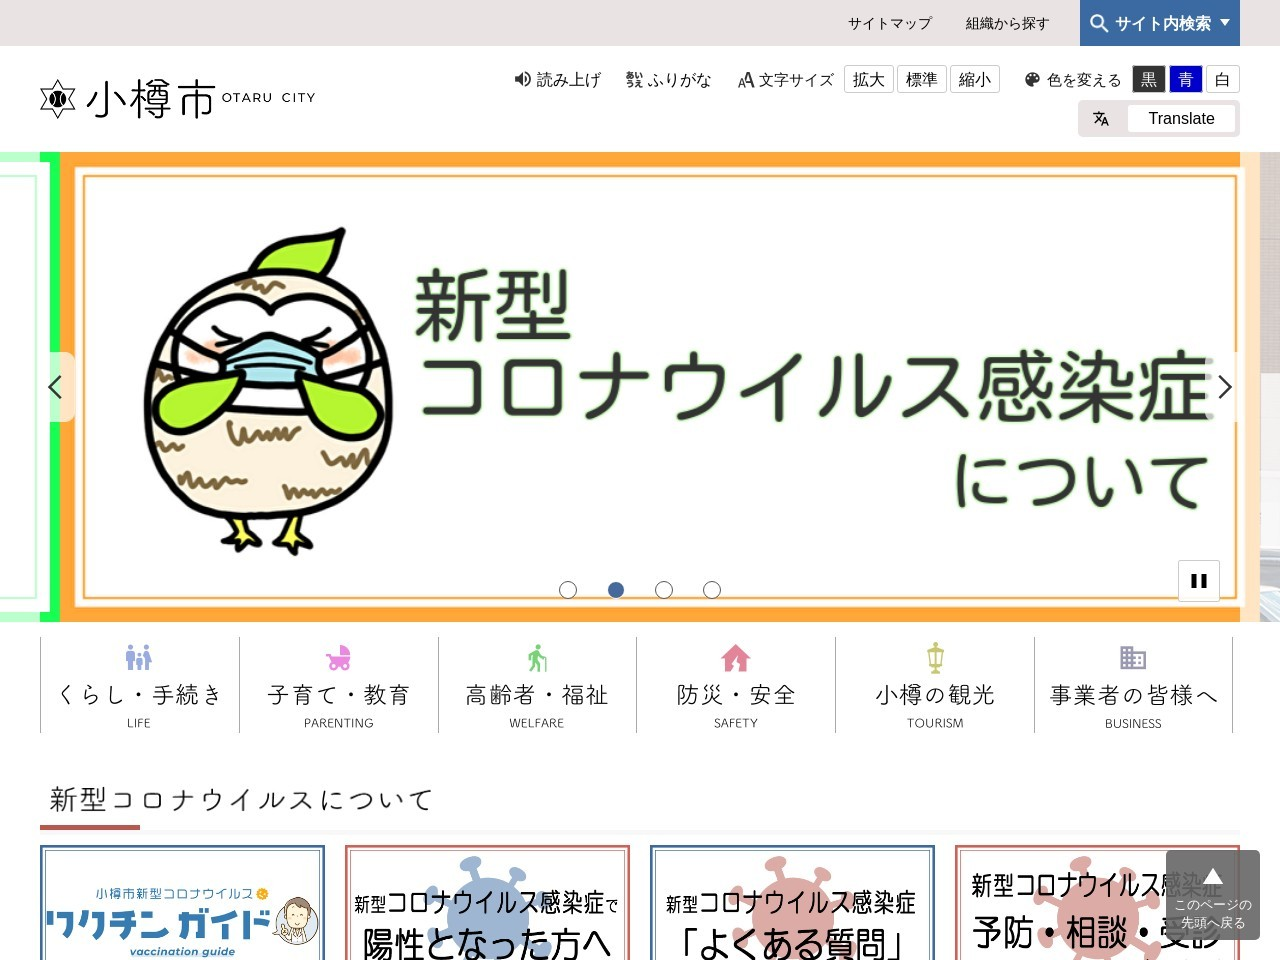 https://www.city.otaru.lg.jp/simin/gakushu_sports/bunka/kyositukaihou/zenki_bunkakaiho.html